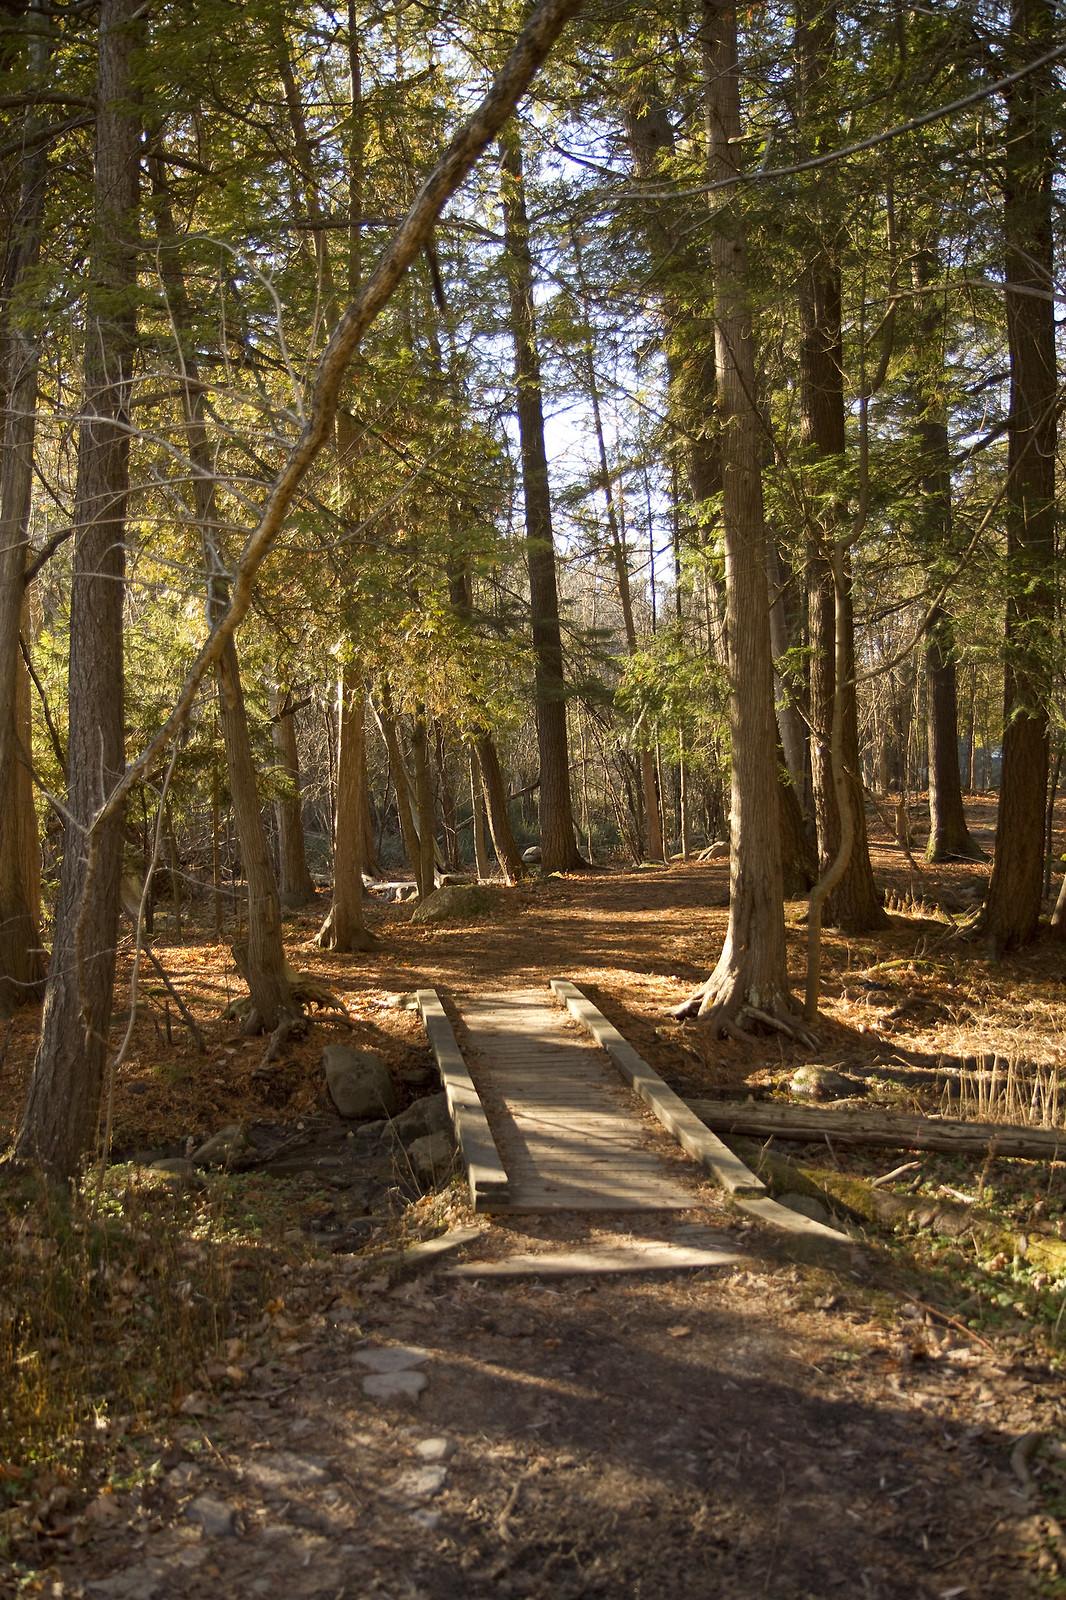 into the trees Jackson creek